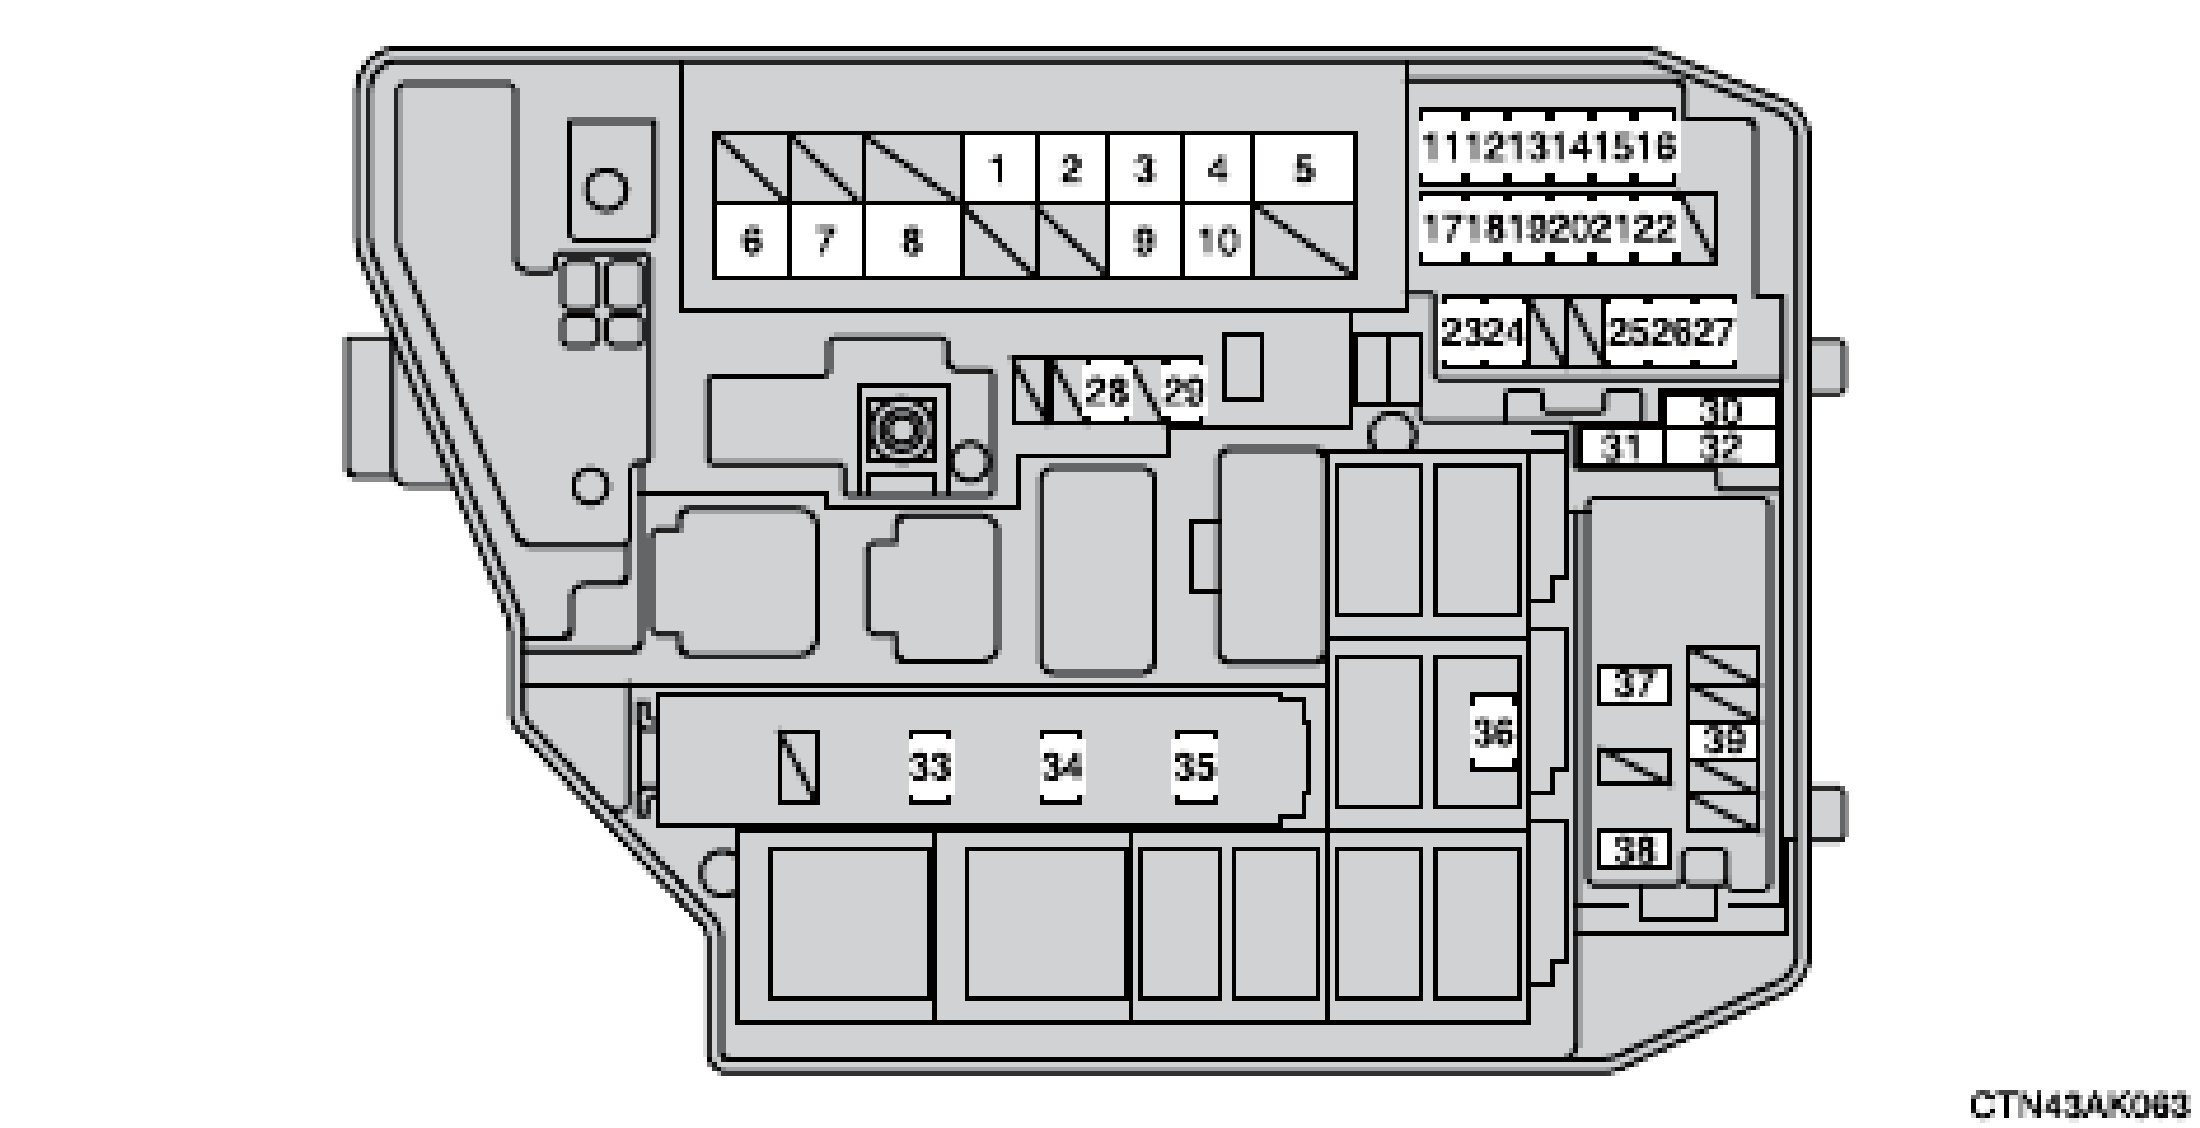 2006 Toyota Corolla Interior Fuse Box Diagram Wiring Will 1990 2003 Panel Nemetas Aufgegabelt Info Rh